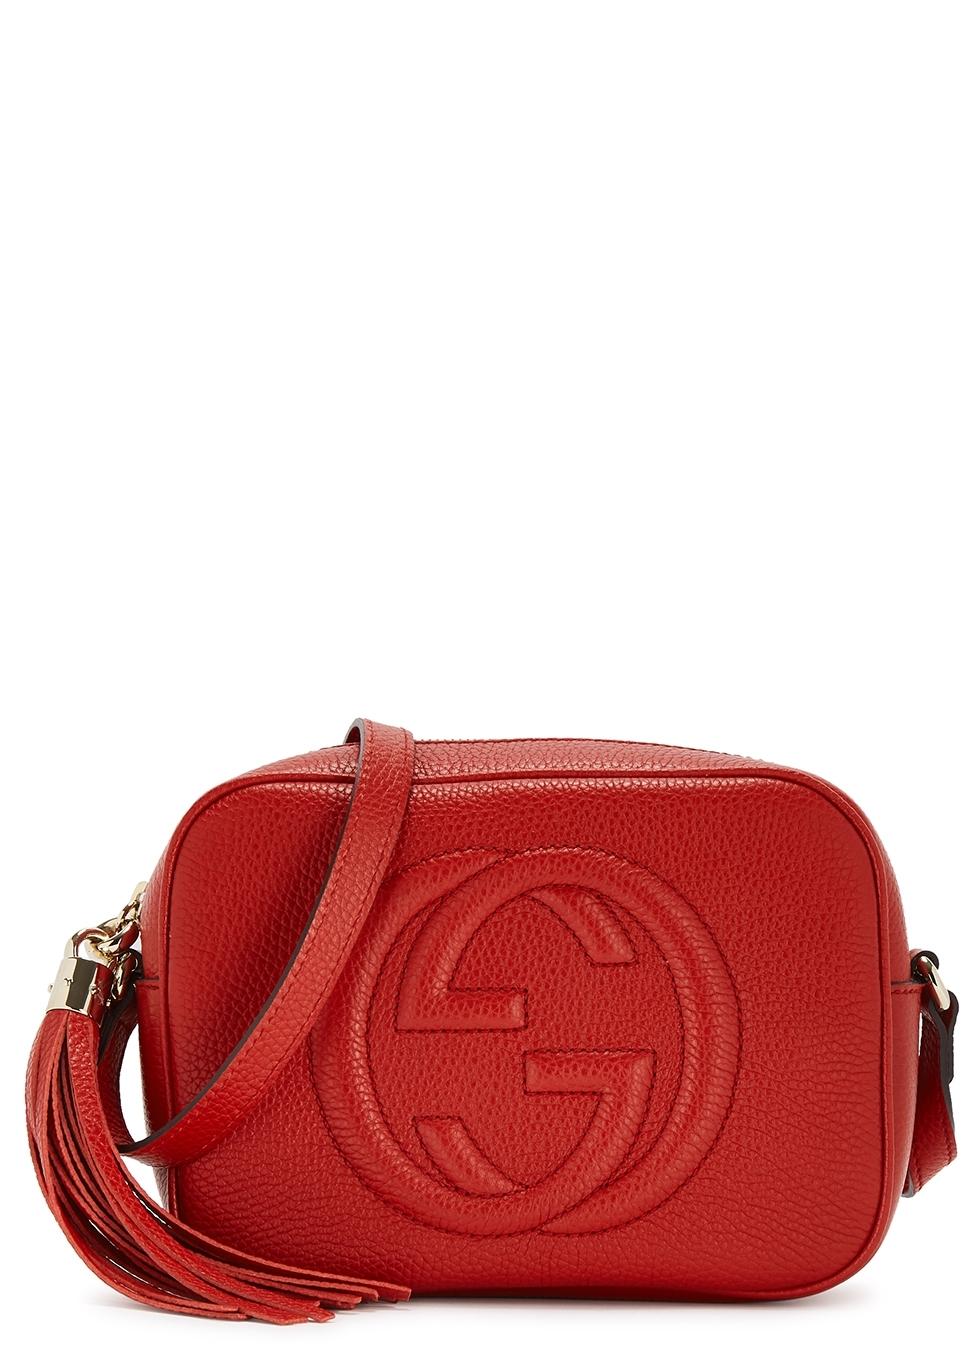 0bb57b03c27a02 Gucci Handbags - Harvey Nichols